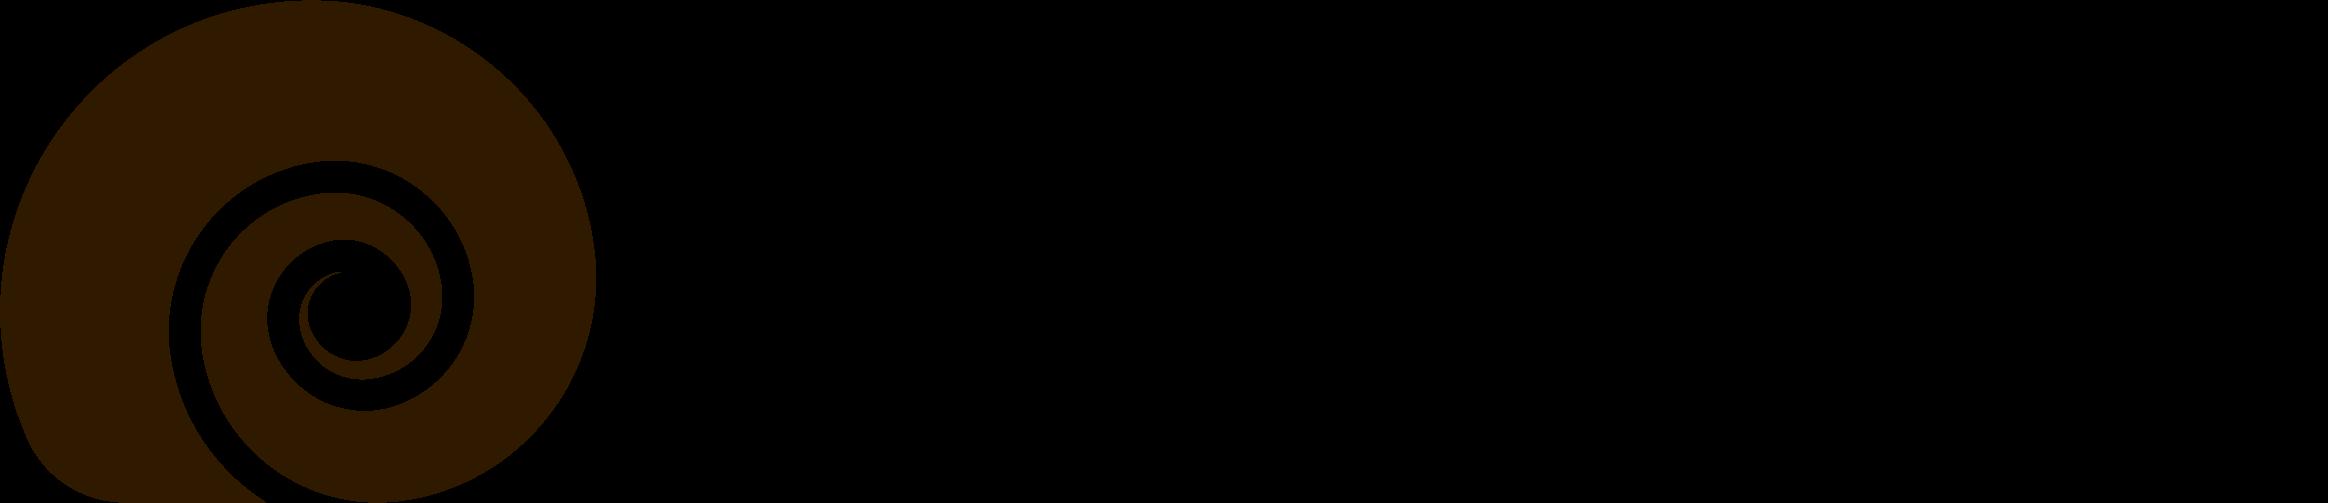 ambra minerals